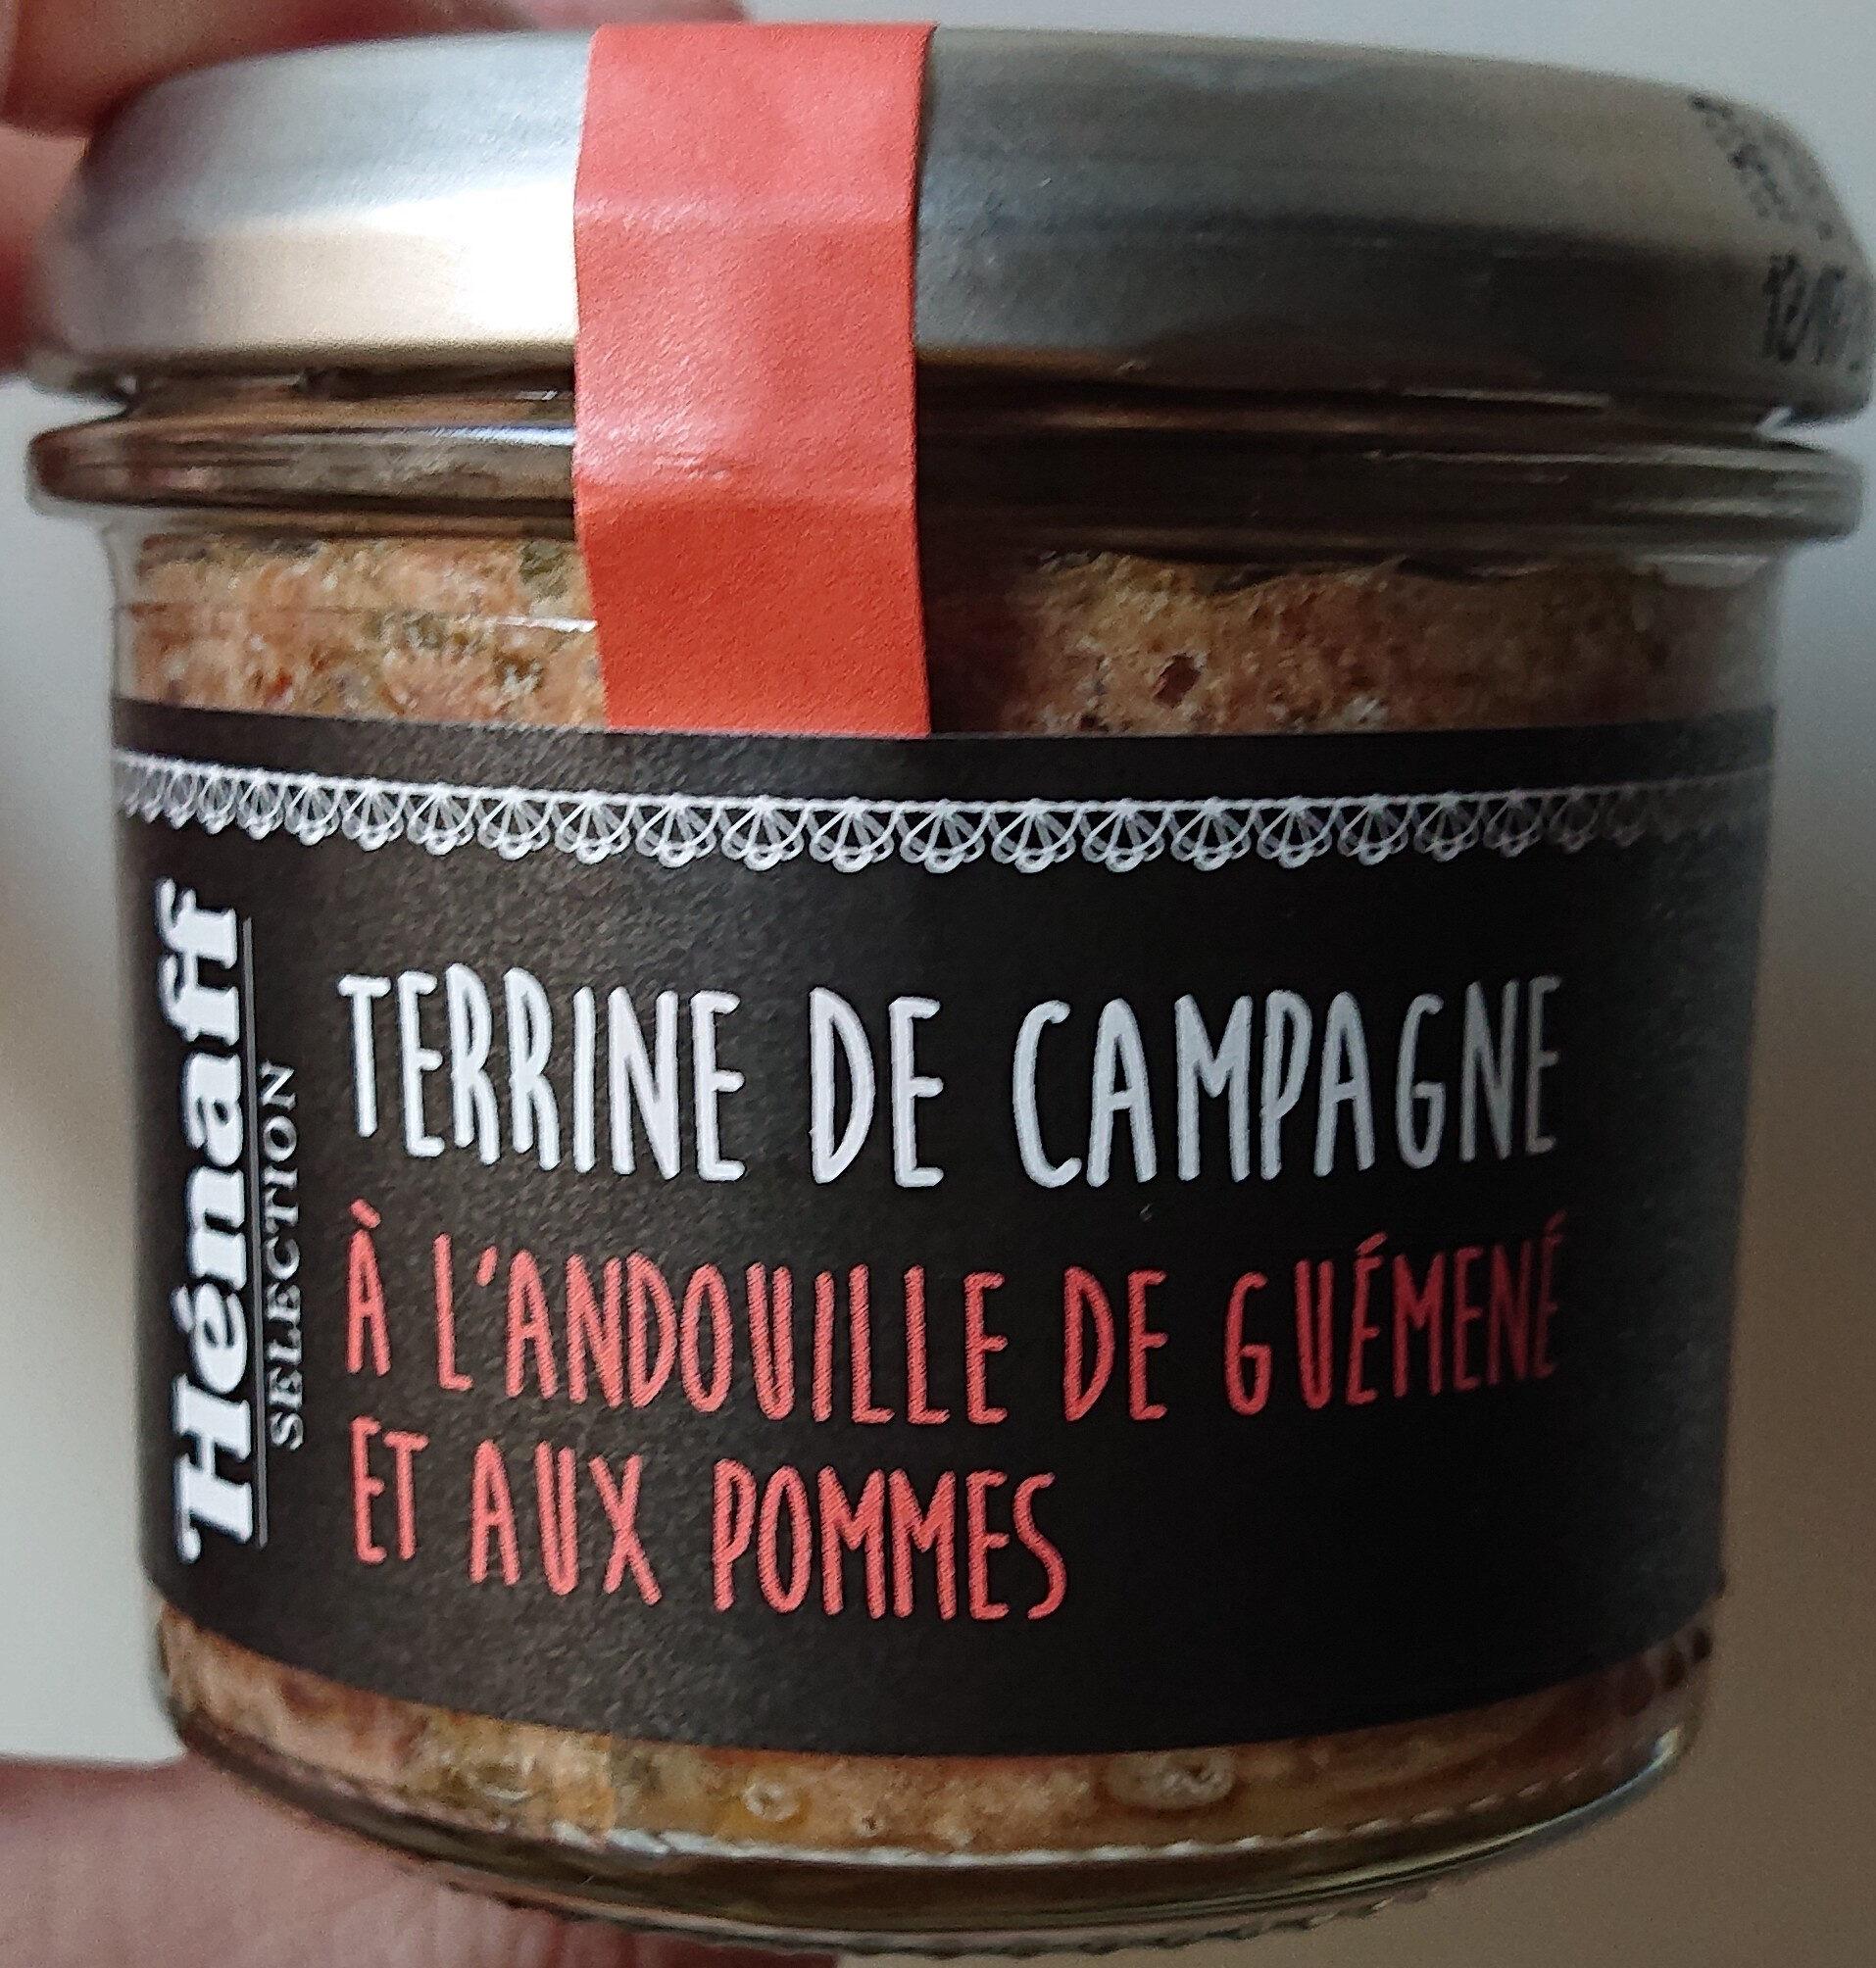 Terrine de campagne - Product - fr